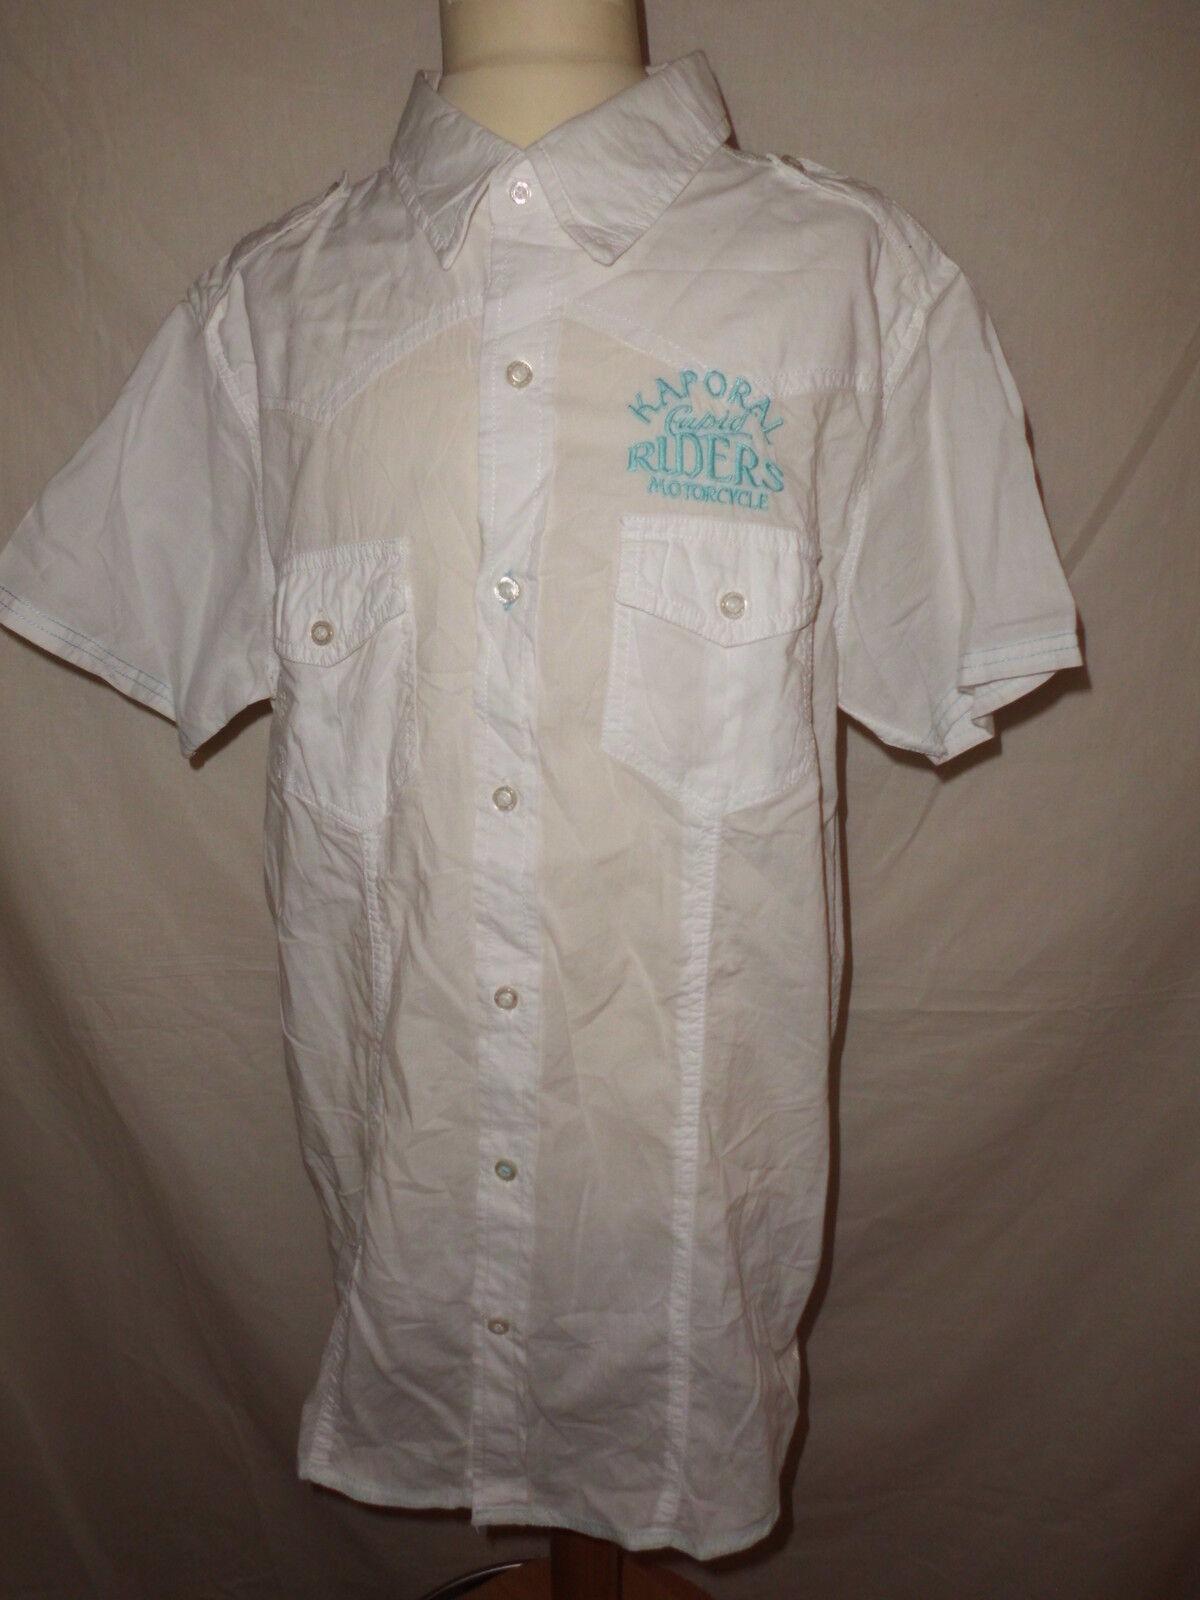 Chemise Taille Kaporal 5 Blanc Taille Chemise M  à  -66%* 1ef94b